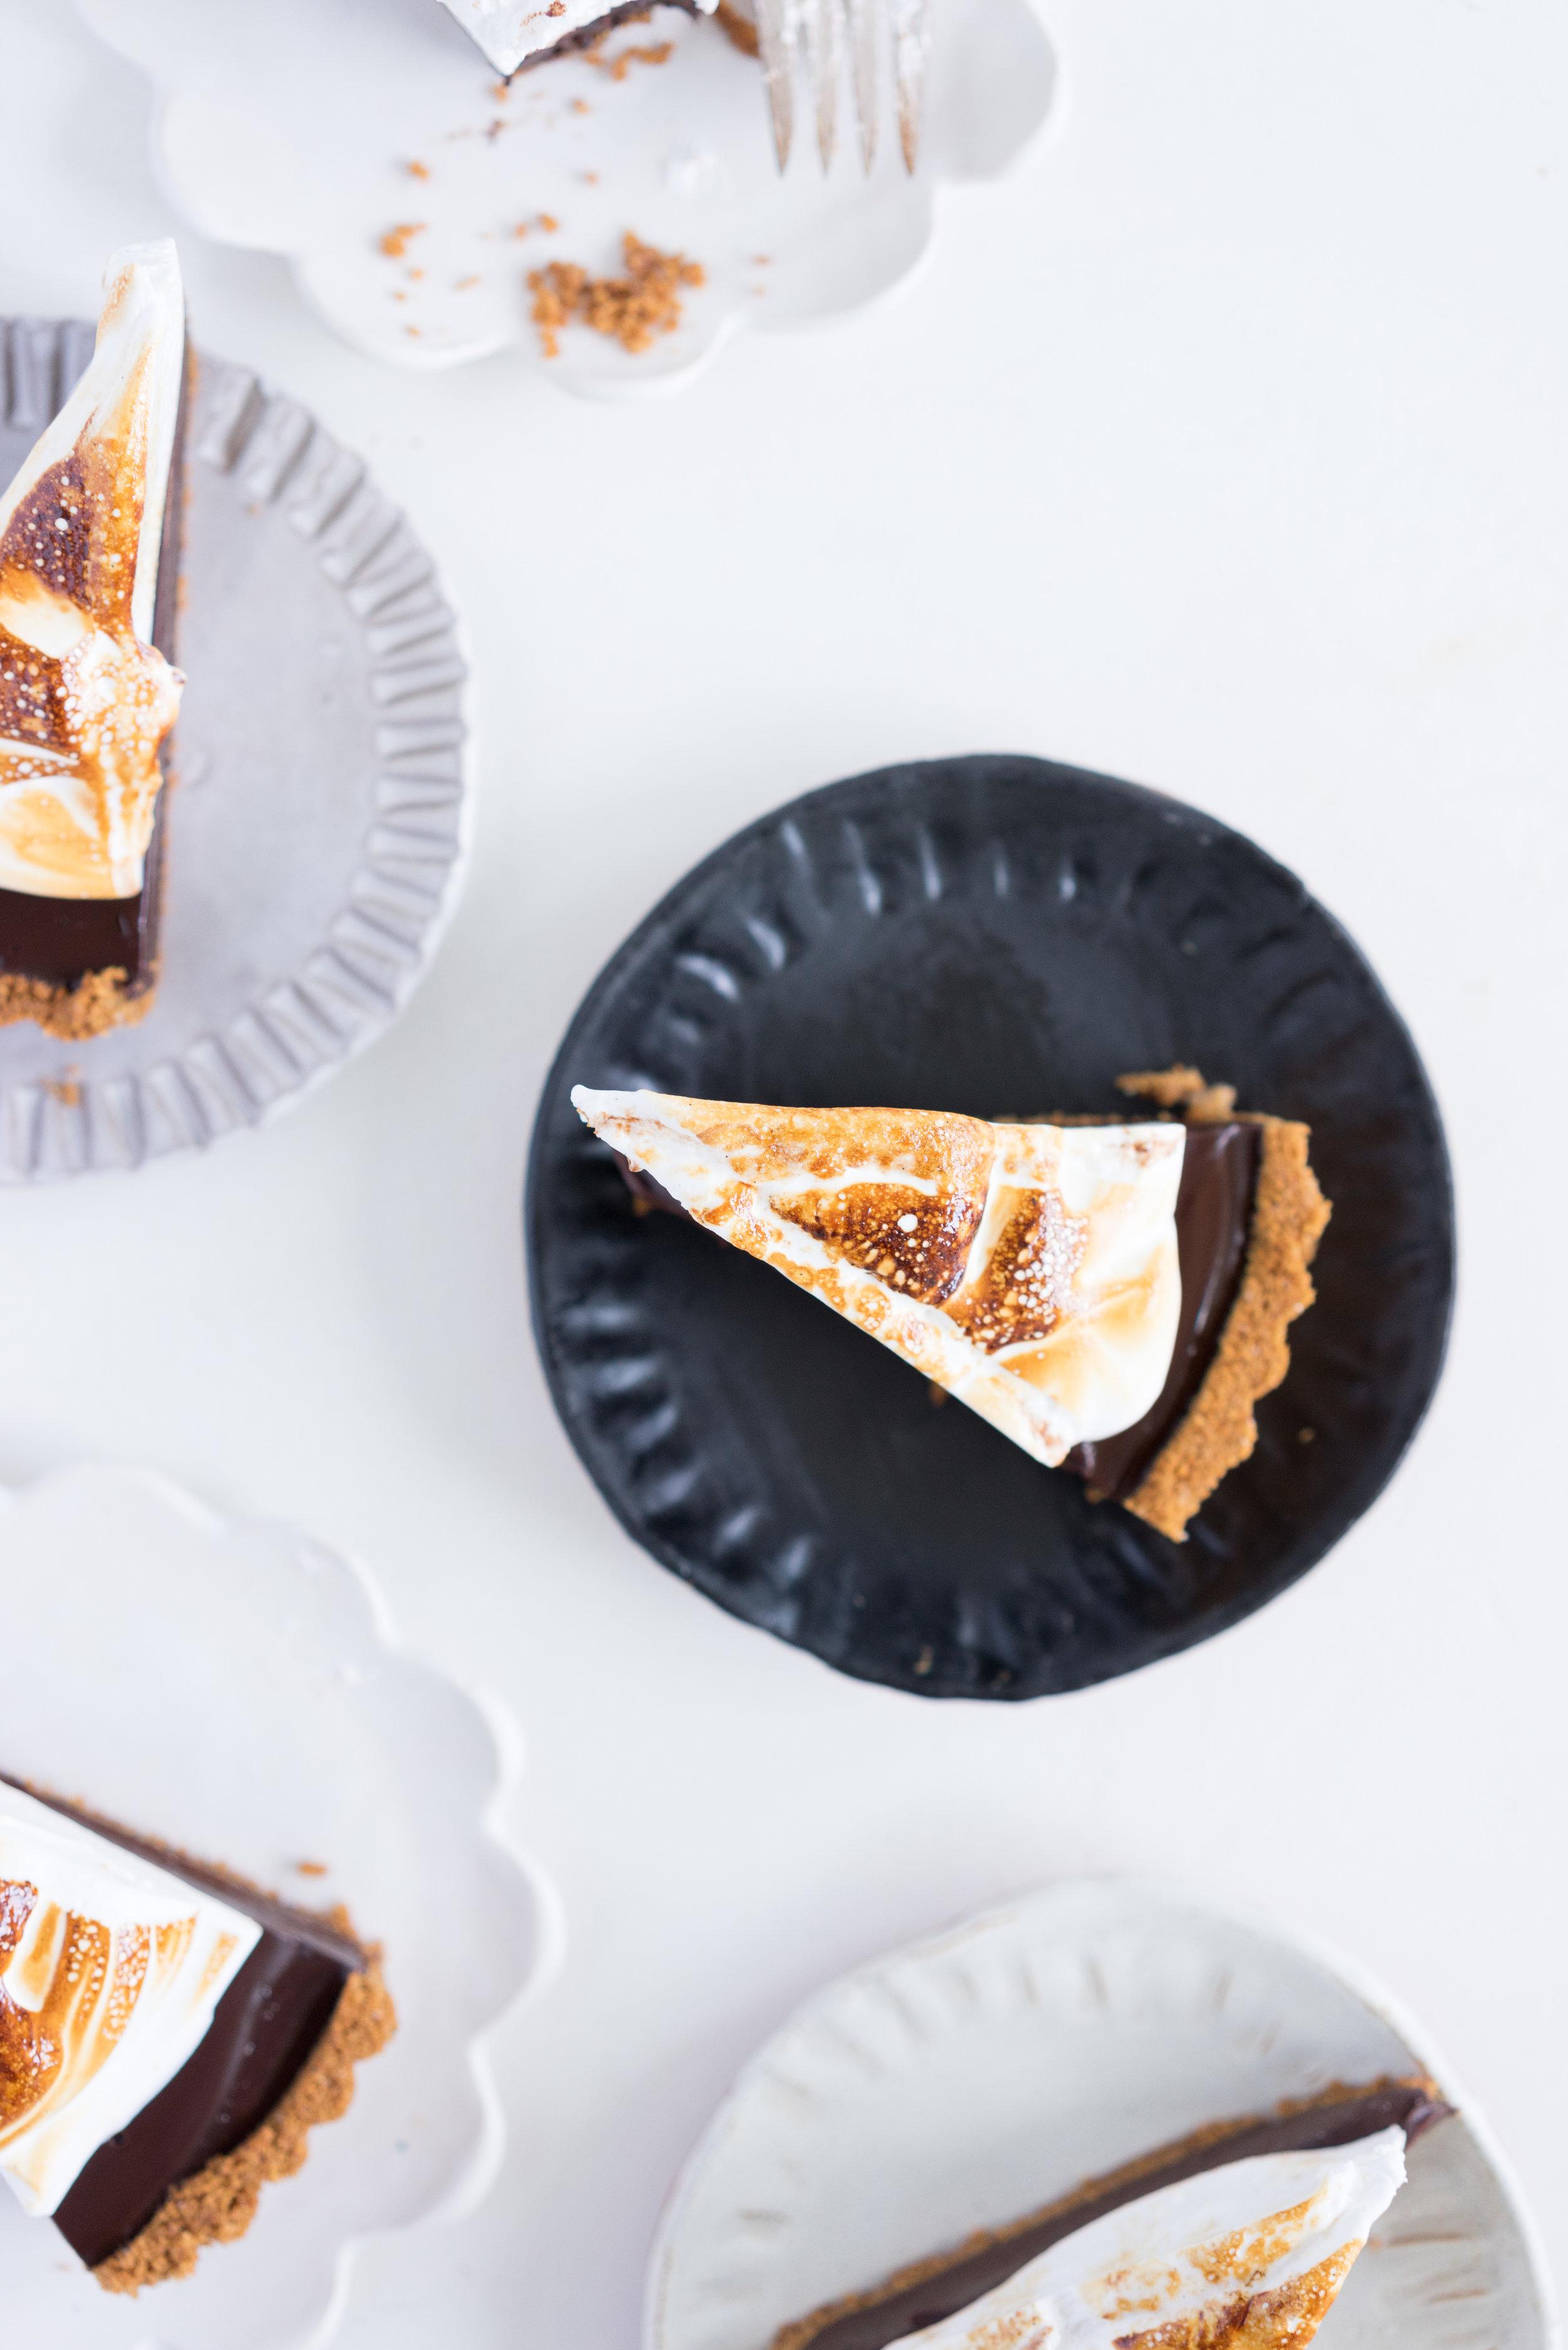 S'mores tart - brown butter graham cracker crust, silky chocolate ganache filling, and toasty vanilla bean marshmallow. #tart #chocolatetart #s'morestart #grahamcracker #smorestart #brownbutter #chocolateganache